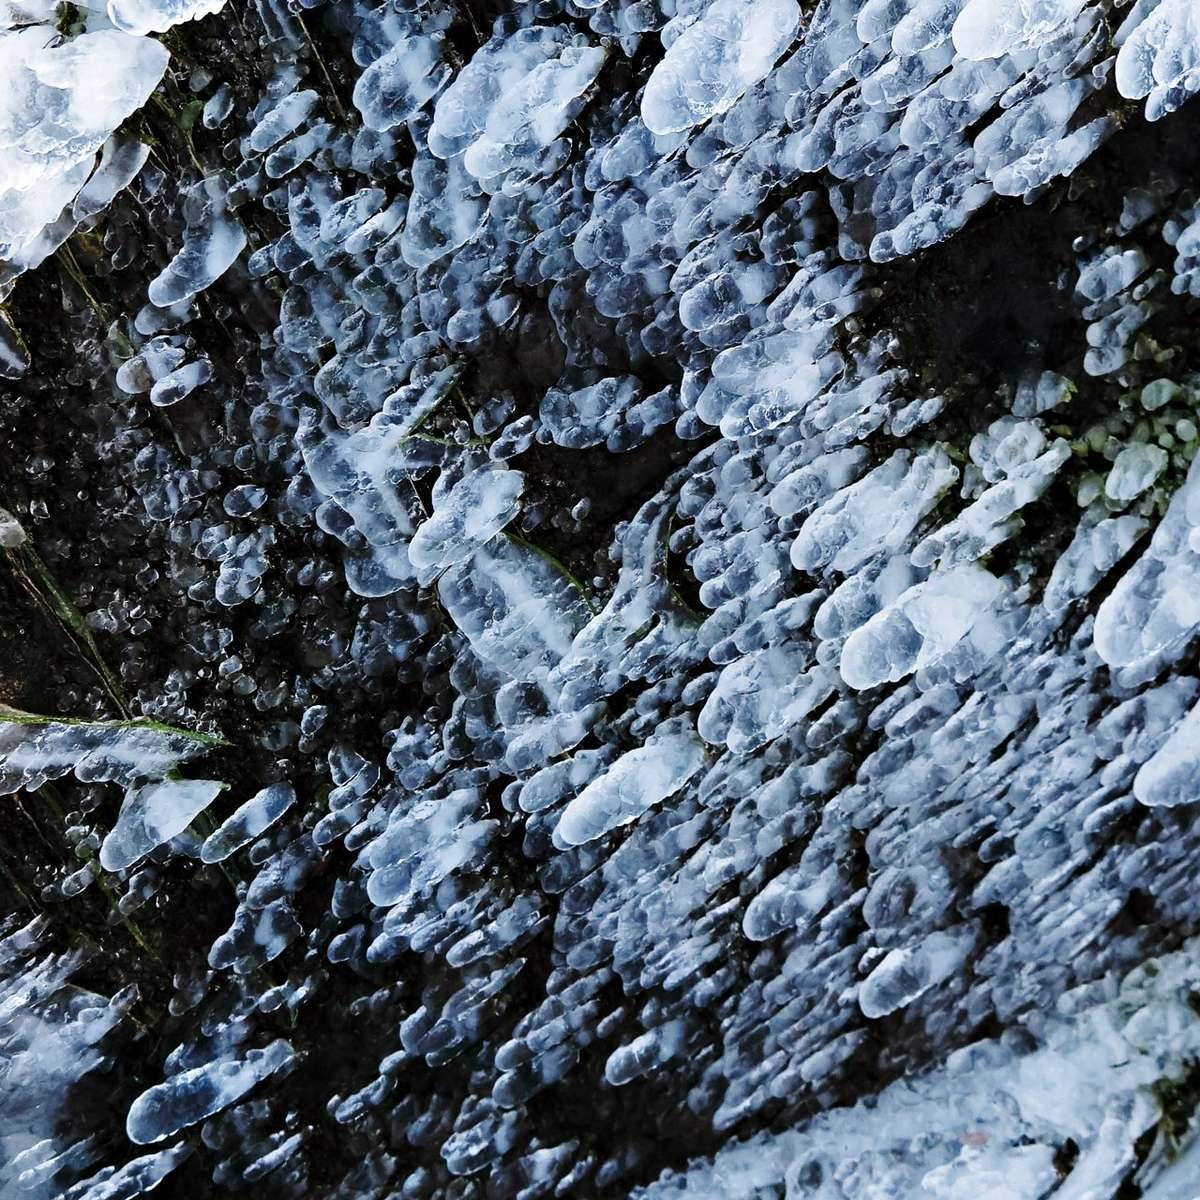 Canon PowerShot G1 X Mark II [ISO125, F5.6, 1/1000s]